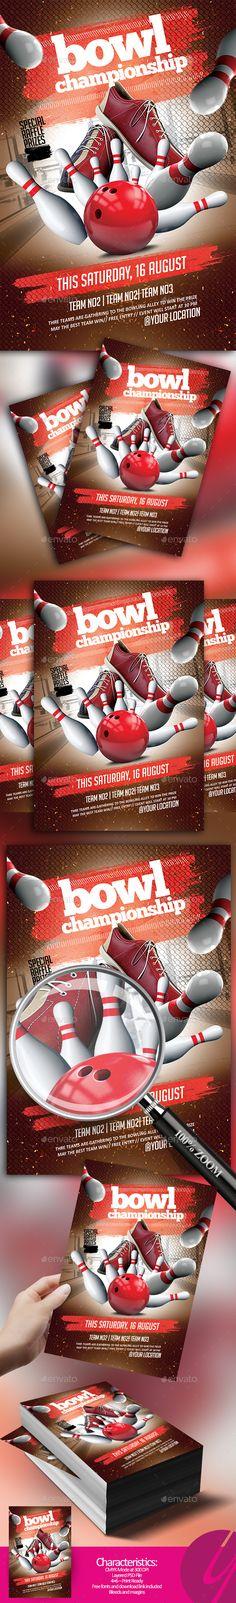 Bowl Championship Flyer - Sports Events